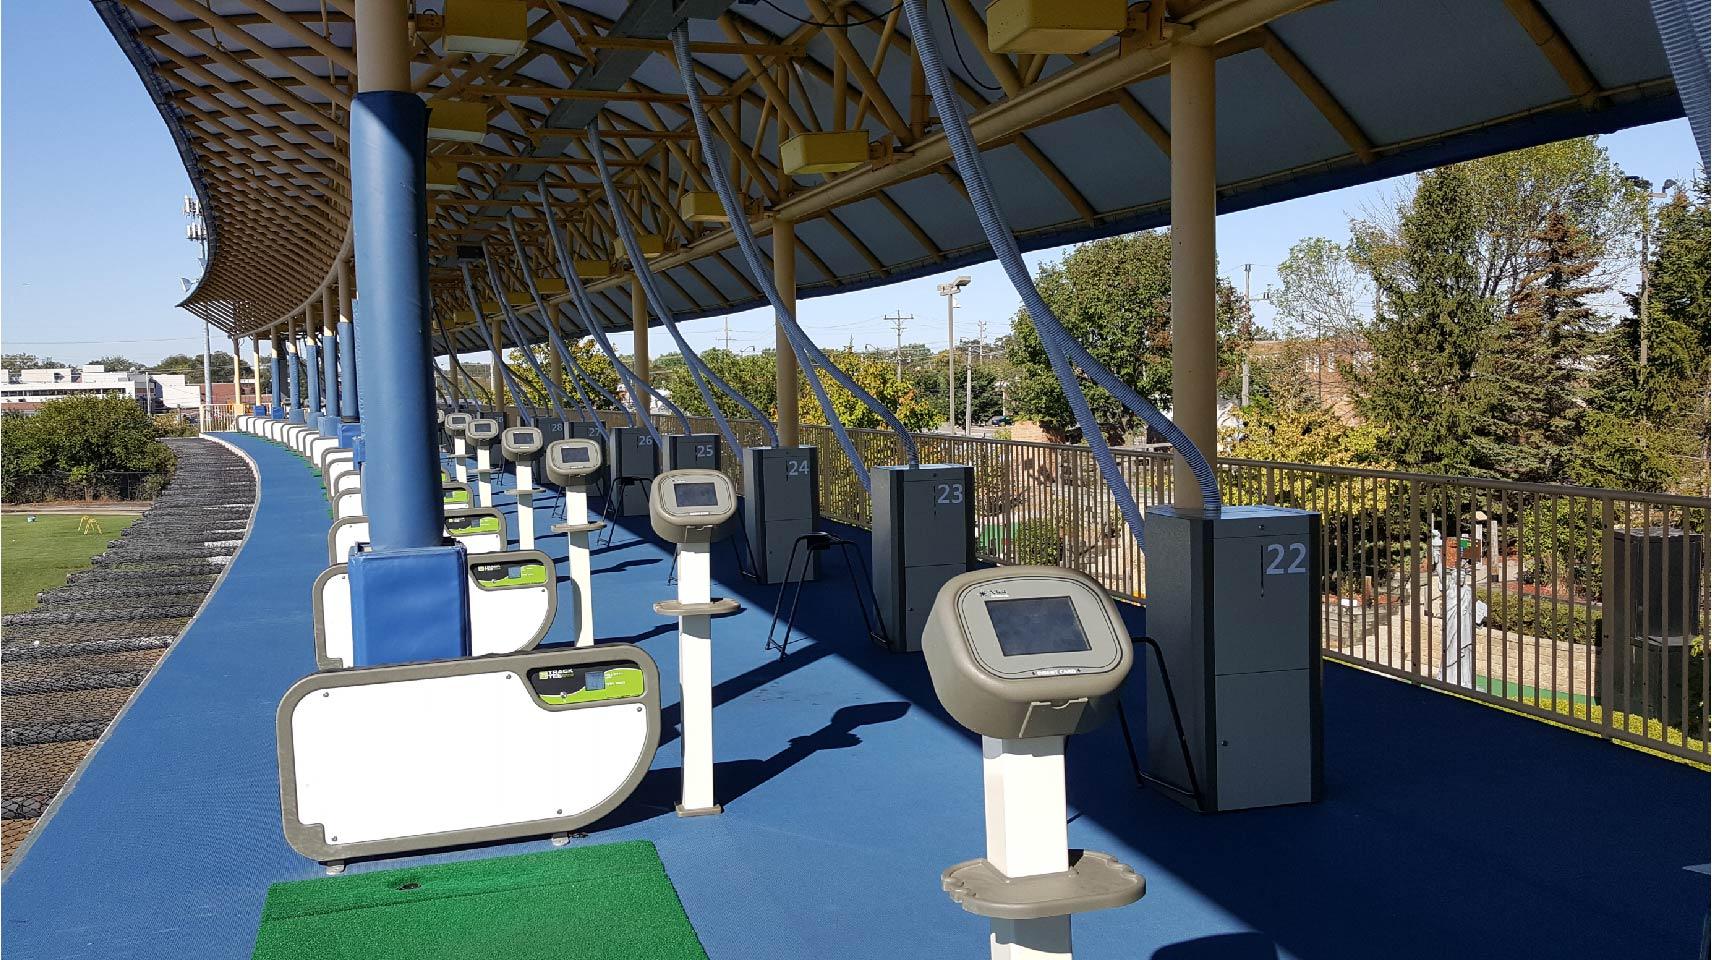 skokie sports park chicago range automation systems skokie sports park chicago range